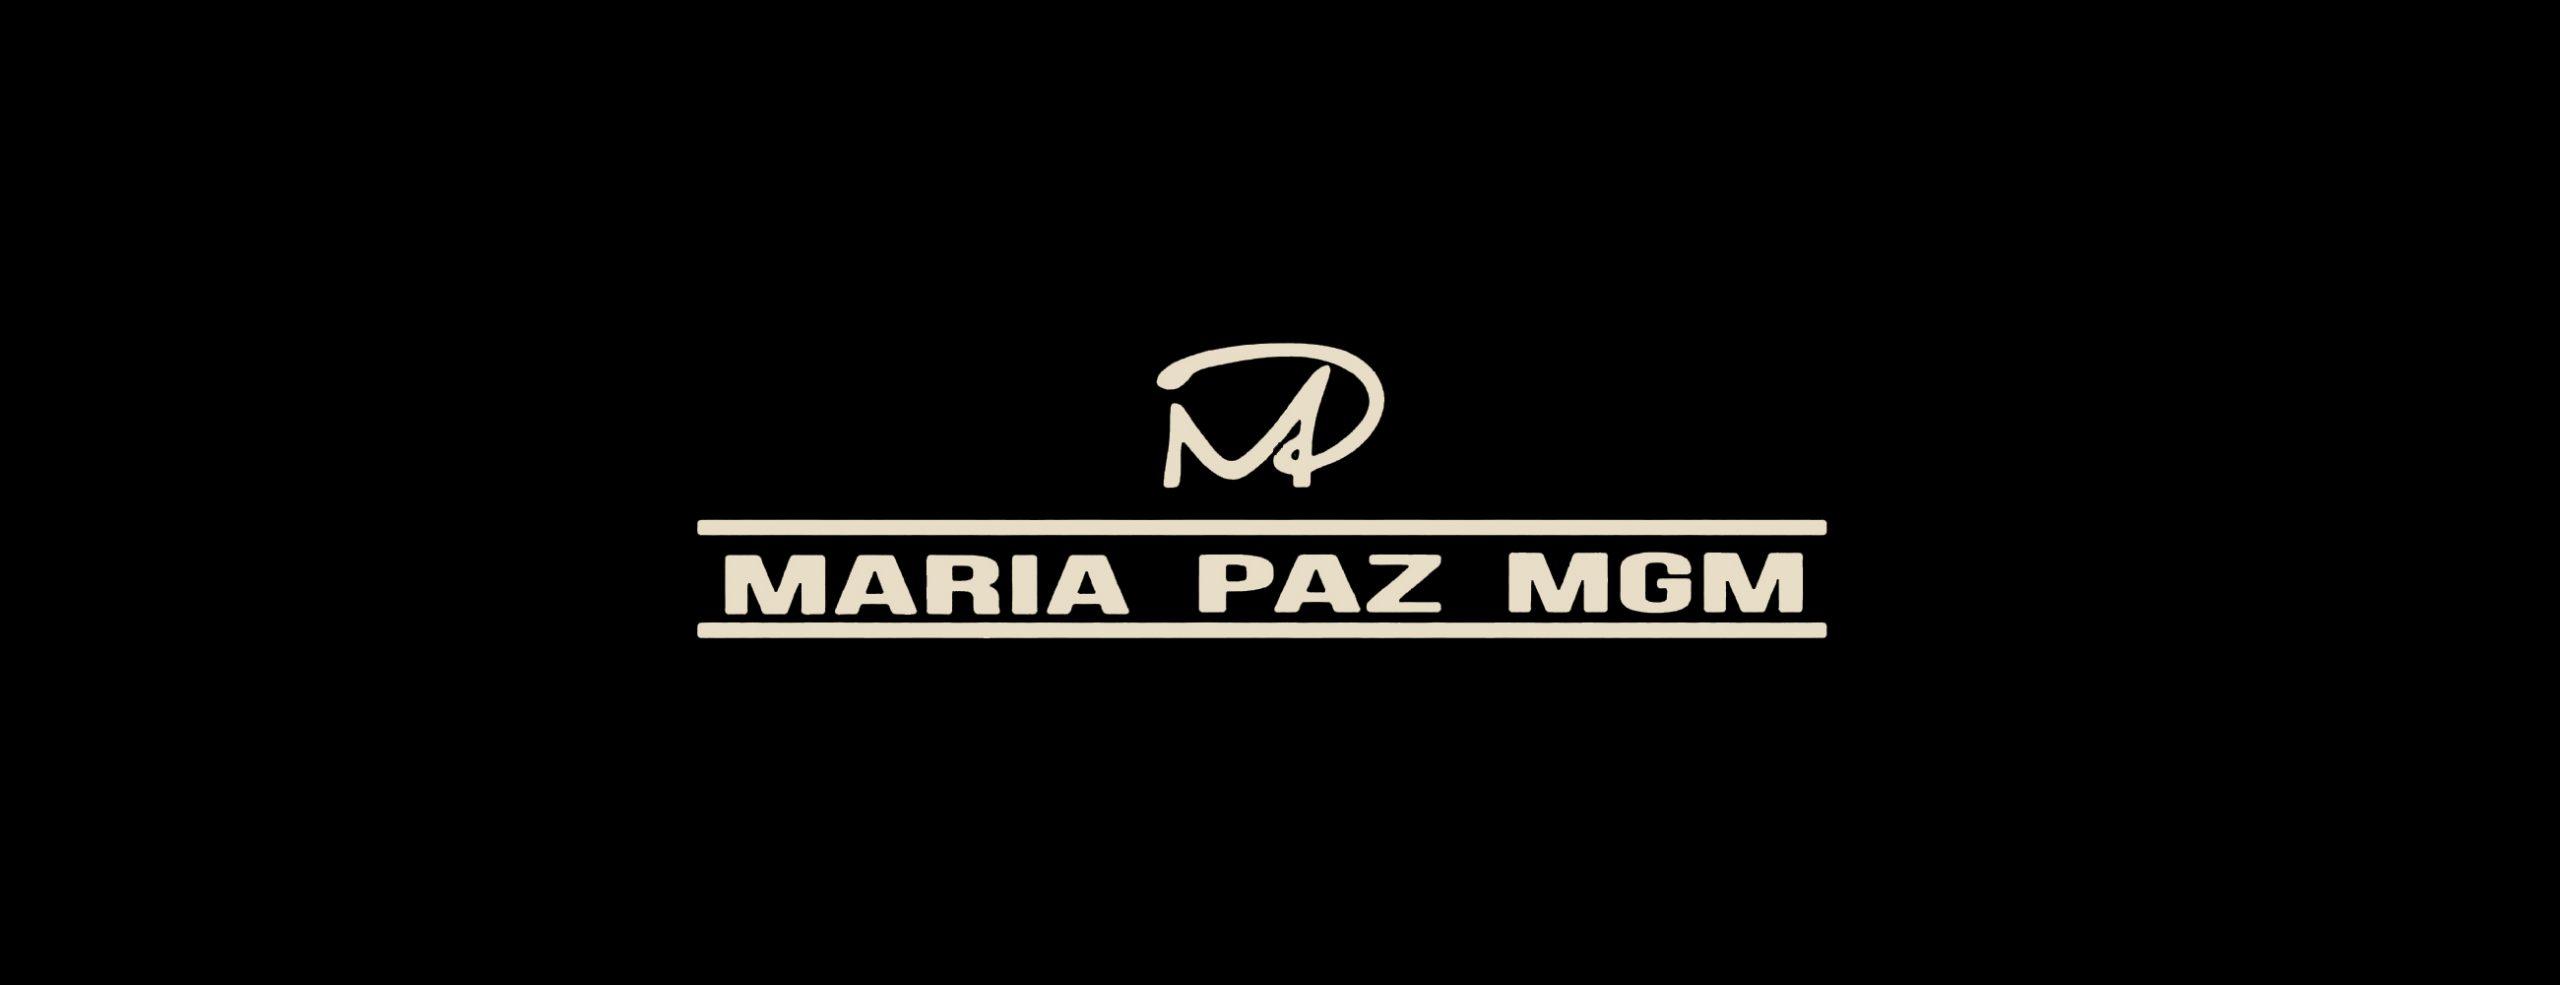 Maria paz MGM